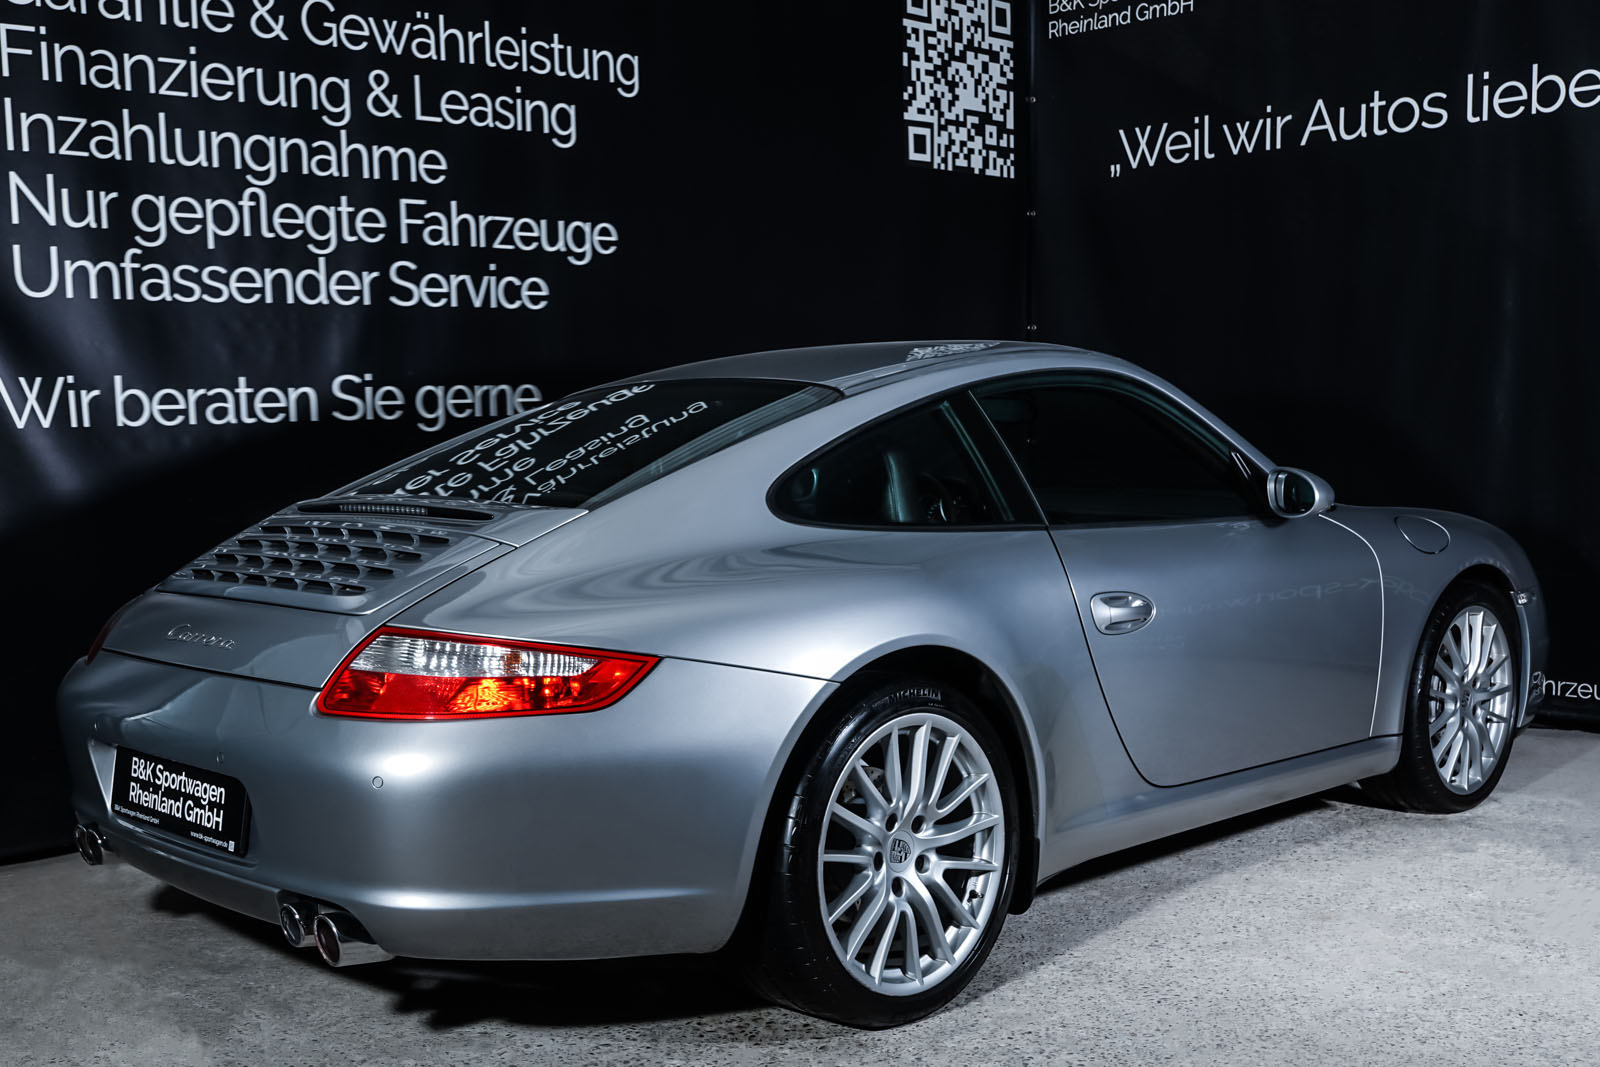 Porsche_997_Carrera_GT-Silber_Brau-1920_14_w